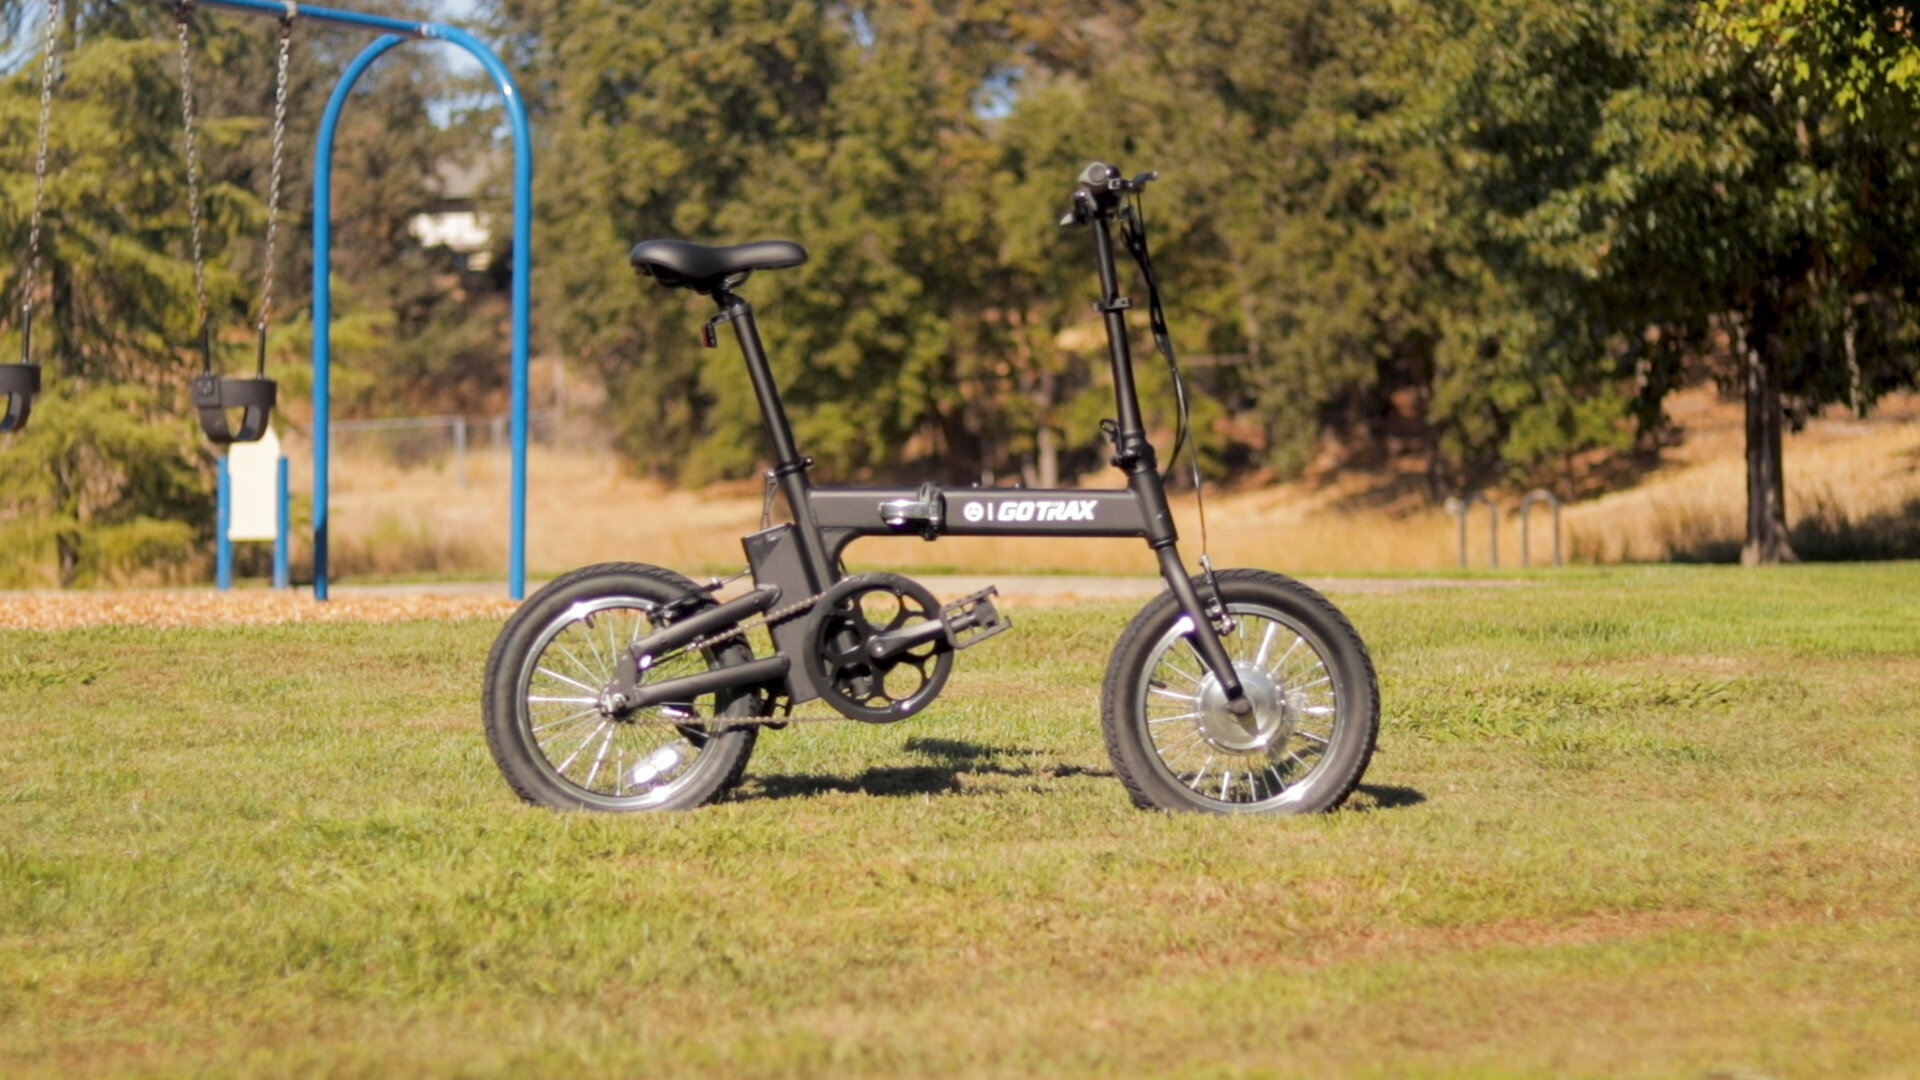 gotrax-shift-s1-electric-bike-review-2019-profile-2.jpg